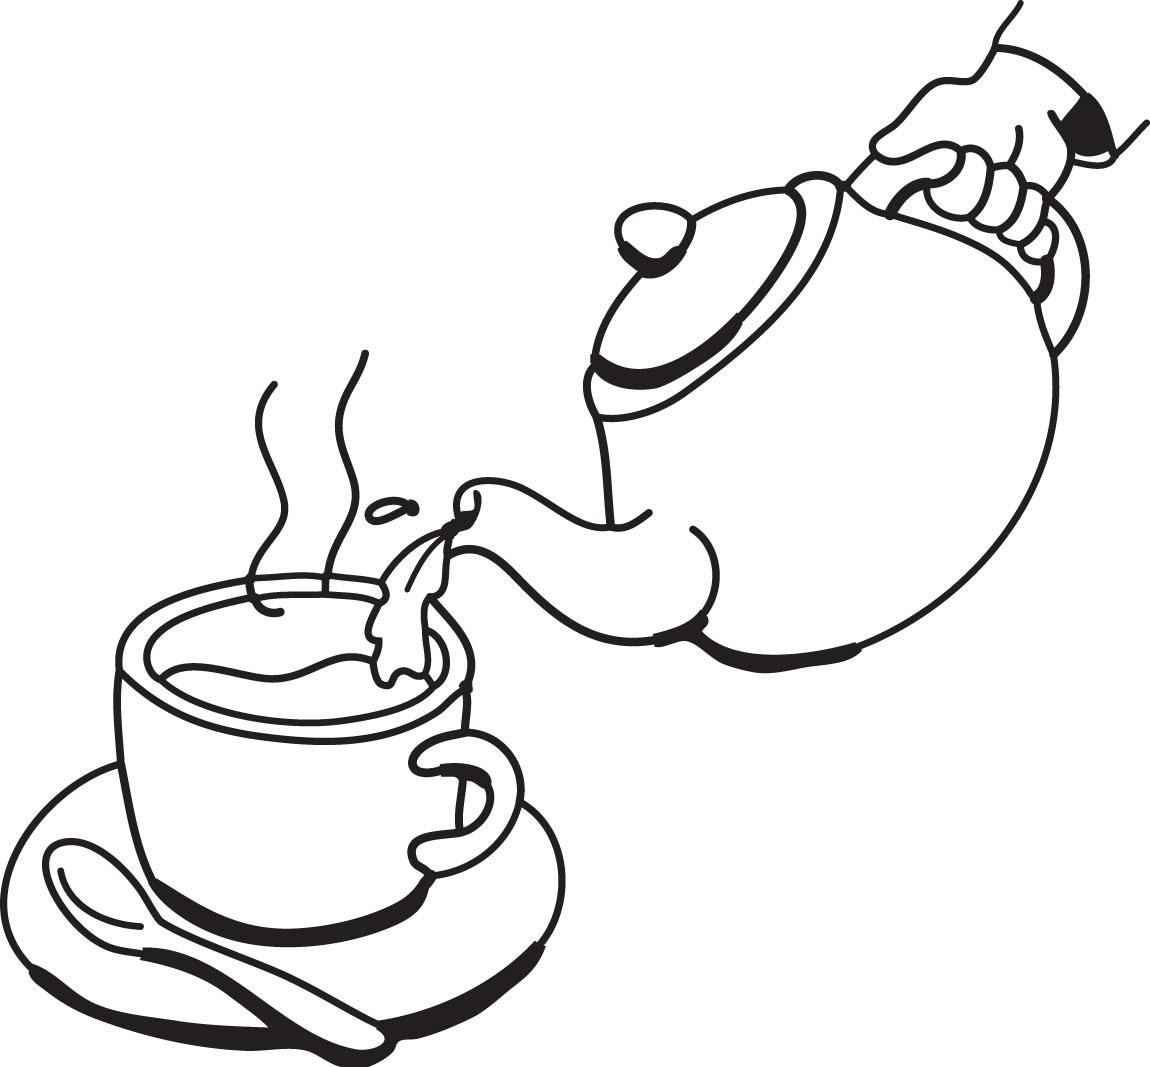 hight resolution of tea cup teapot fancy teacup clip art free clipart images 2 clipartandscrap